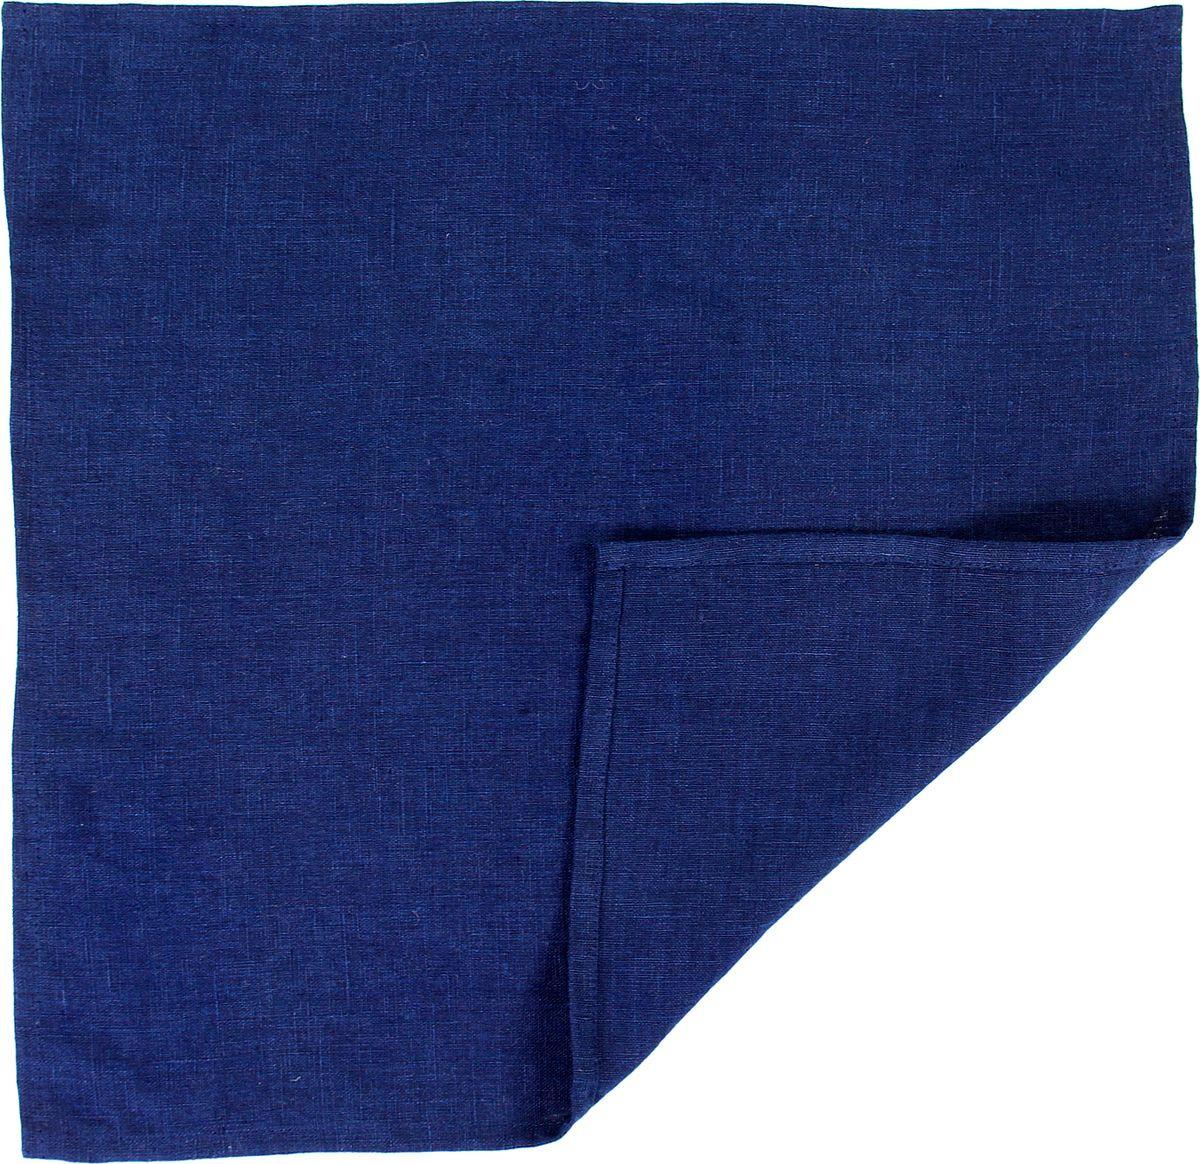 Салфетка столовая Tkano Essential, TK18-NA0010, темно-синий, 45 x см